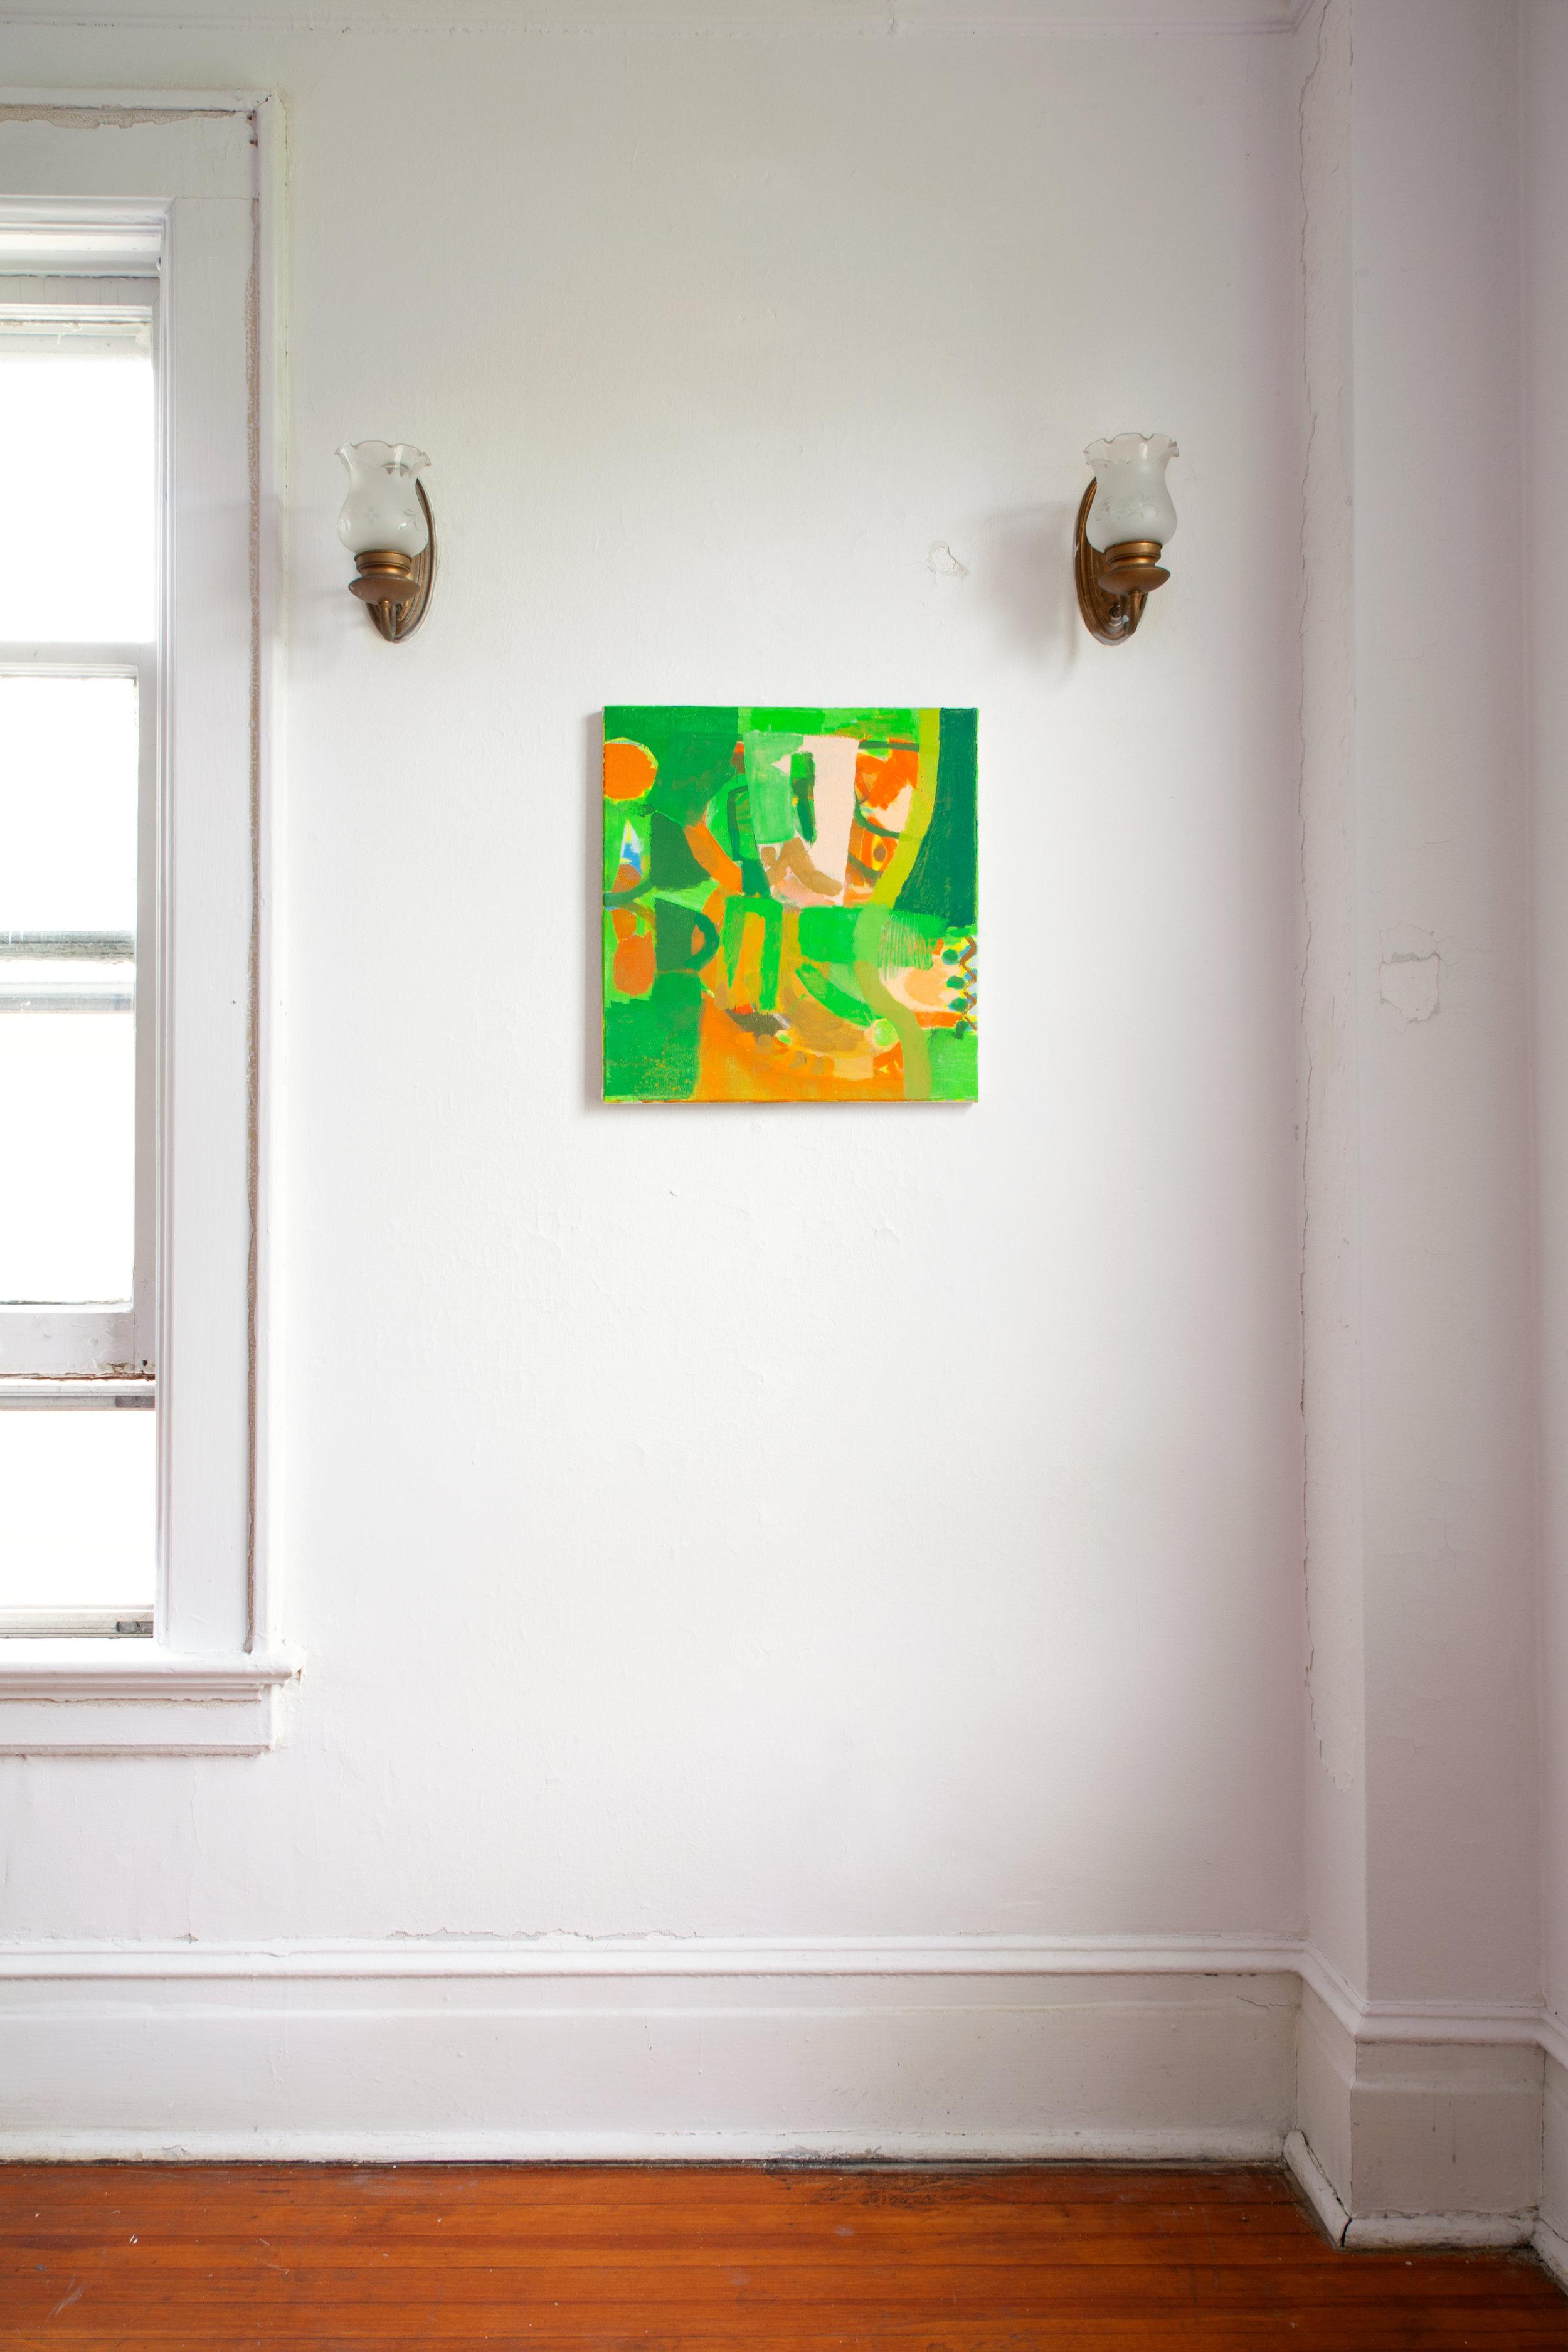 Meghan_Brady-NADA_House-2019-installation_view_05.jpg